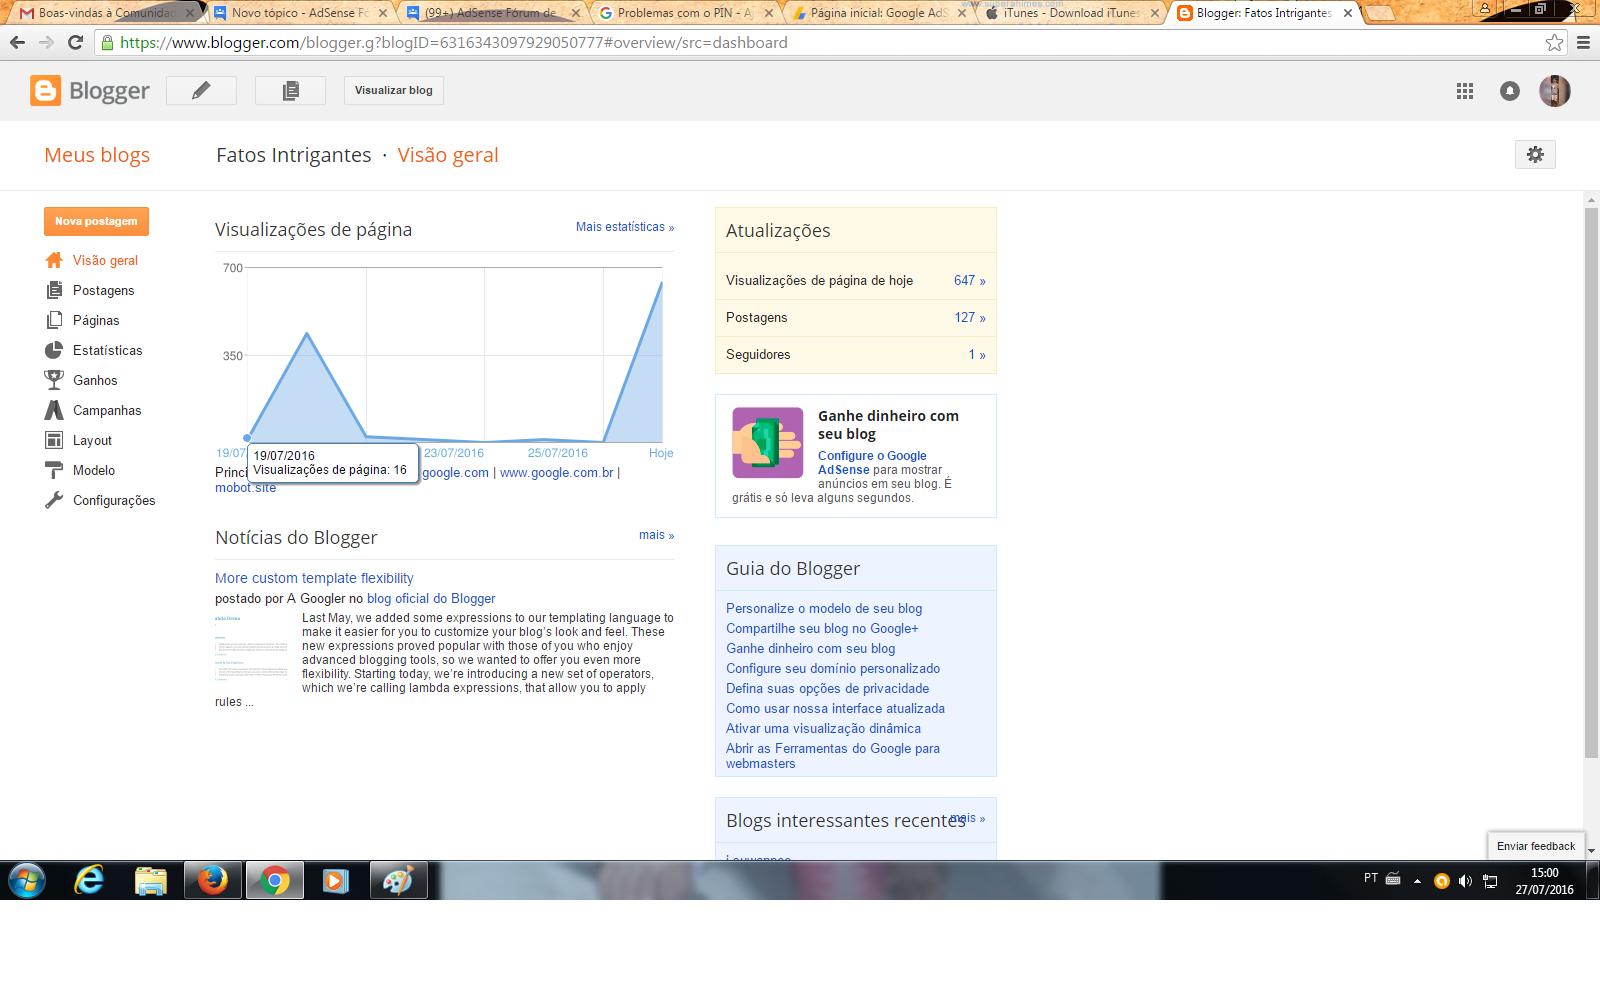 Porque no meu blogger ta marcando quase 700 views por dia e